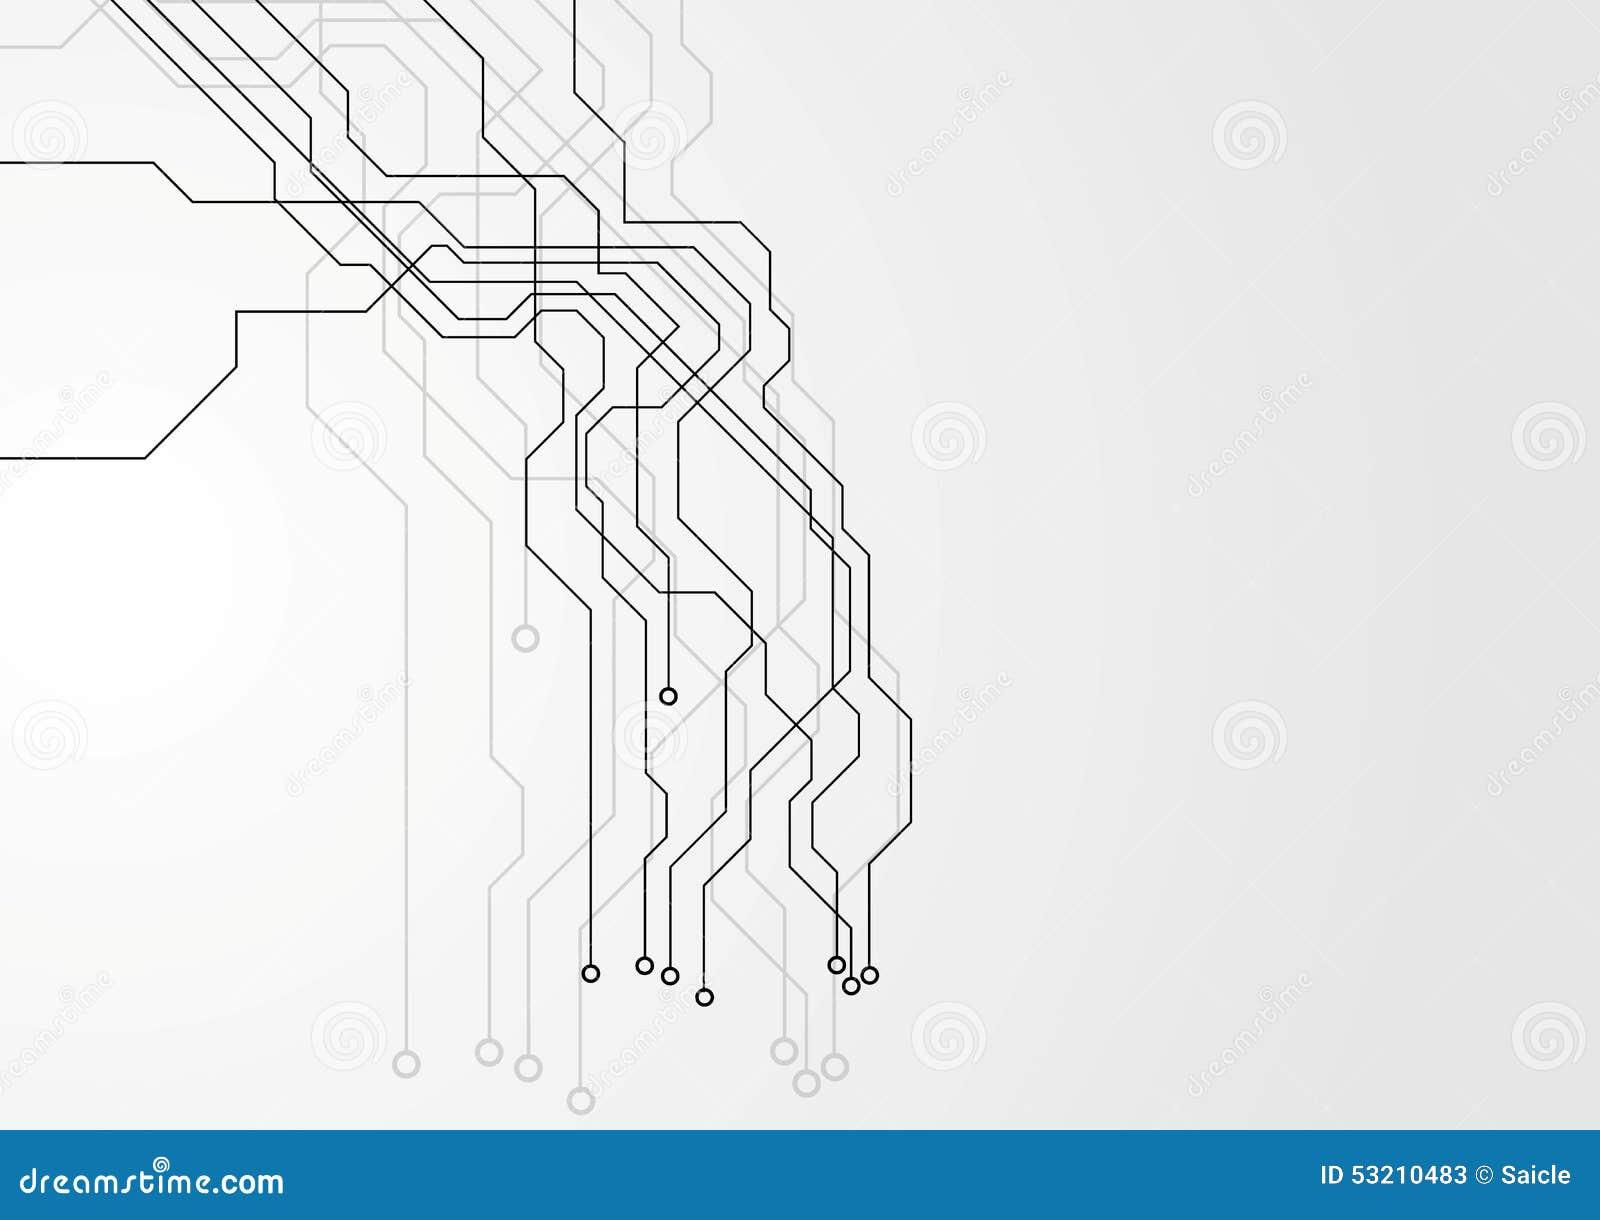 Tree Design On Circuit Board Wallpaper Vector Image: Grey Hi-tech Circuit Board Background Stock Vector